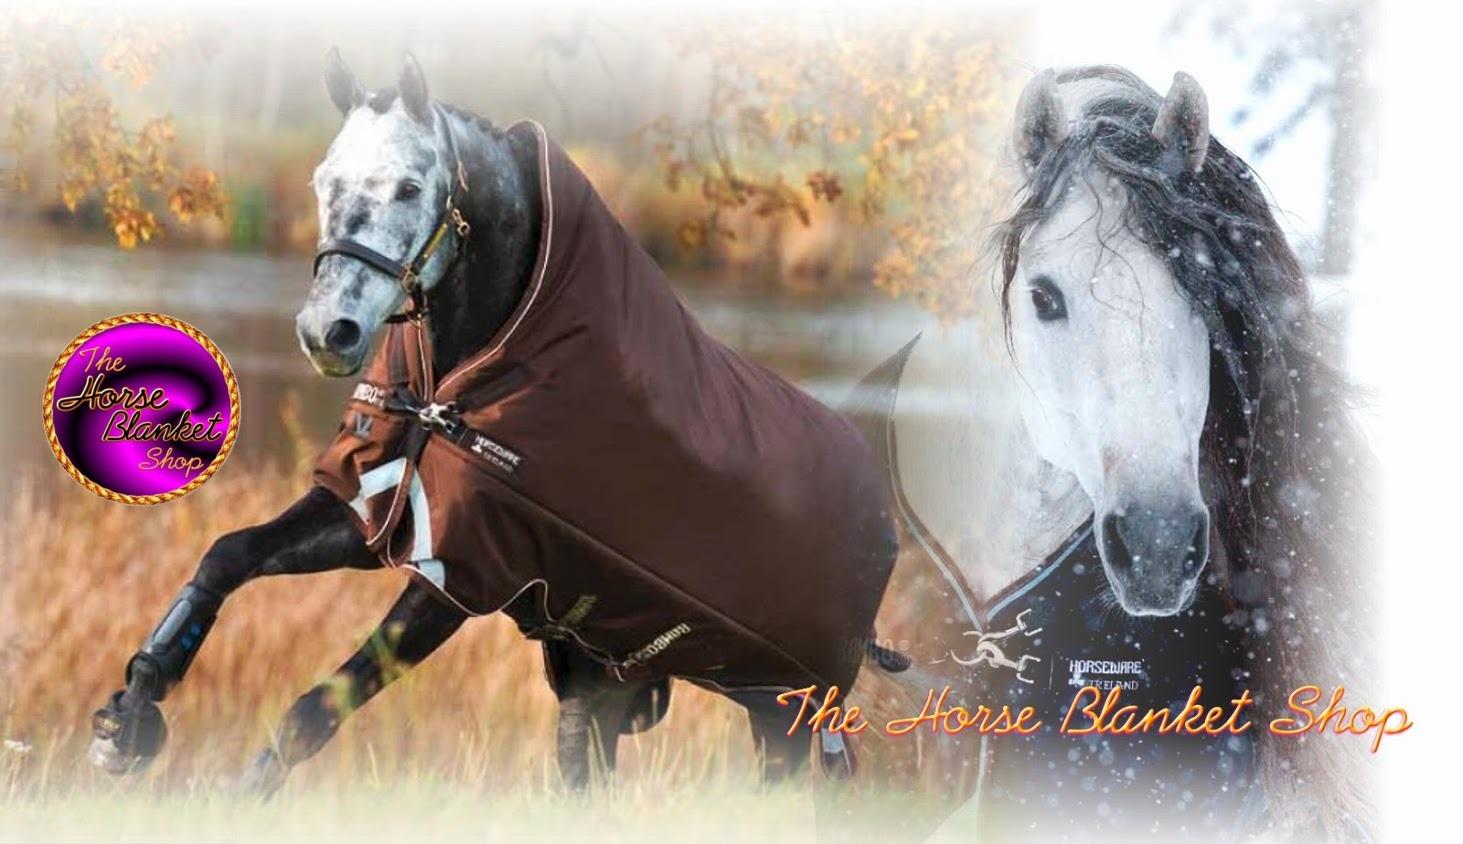 The Horse Blanket Shop